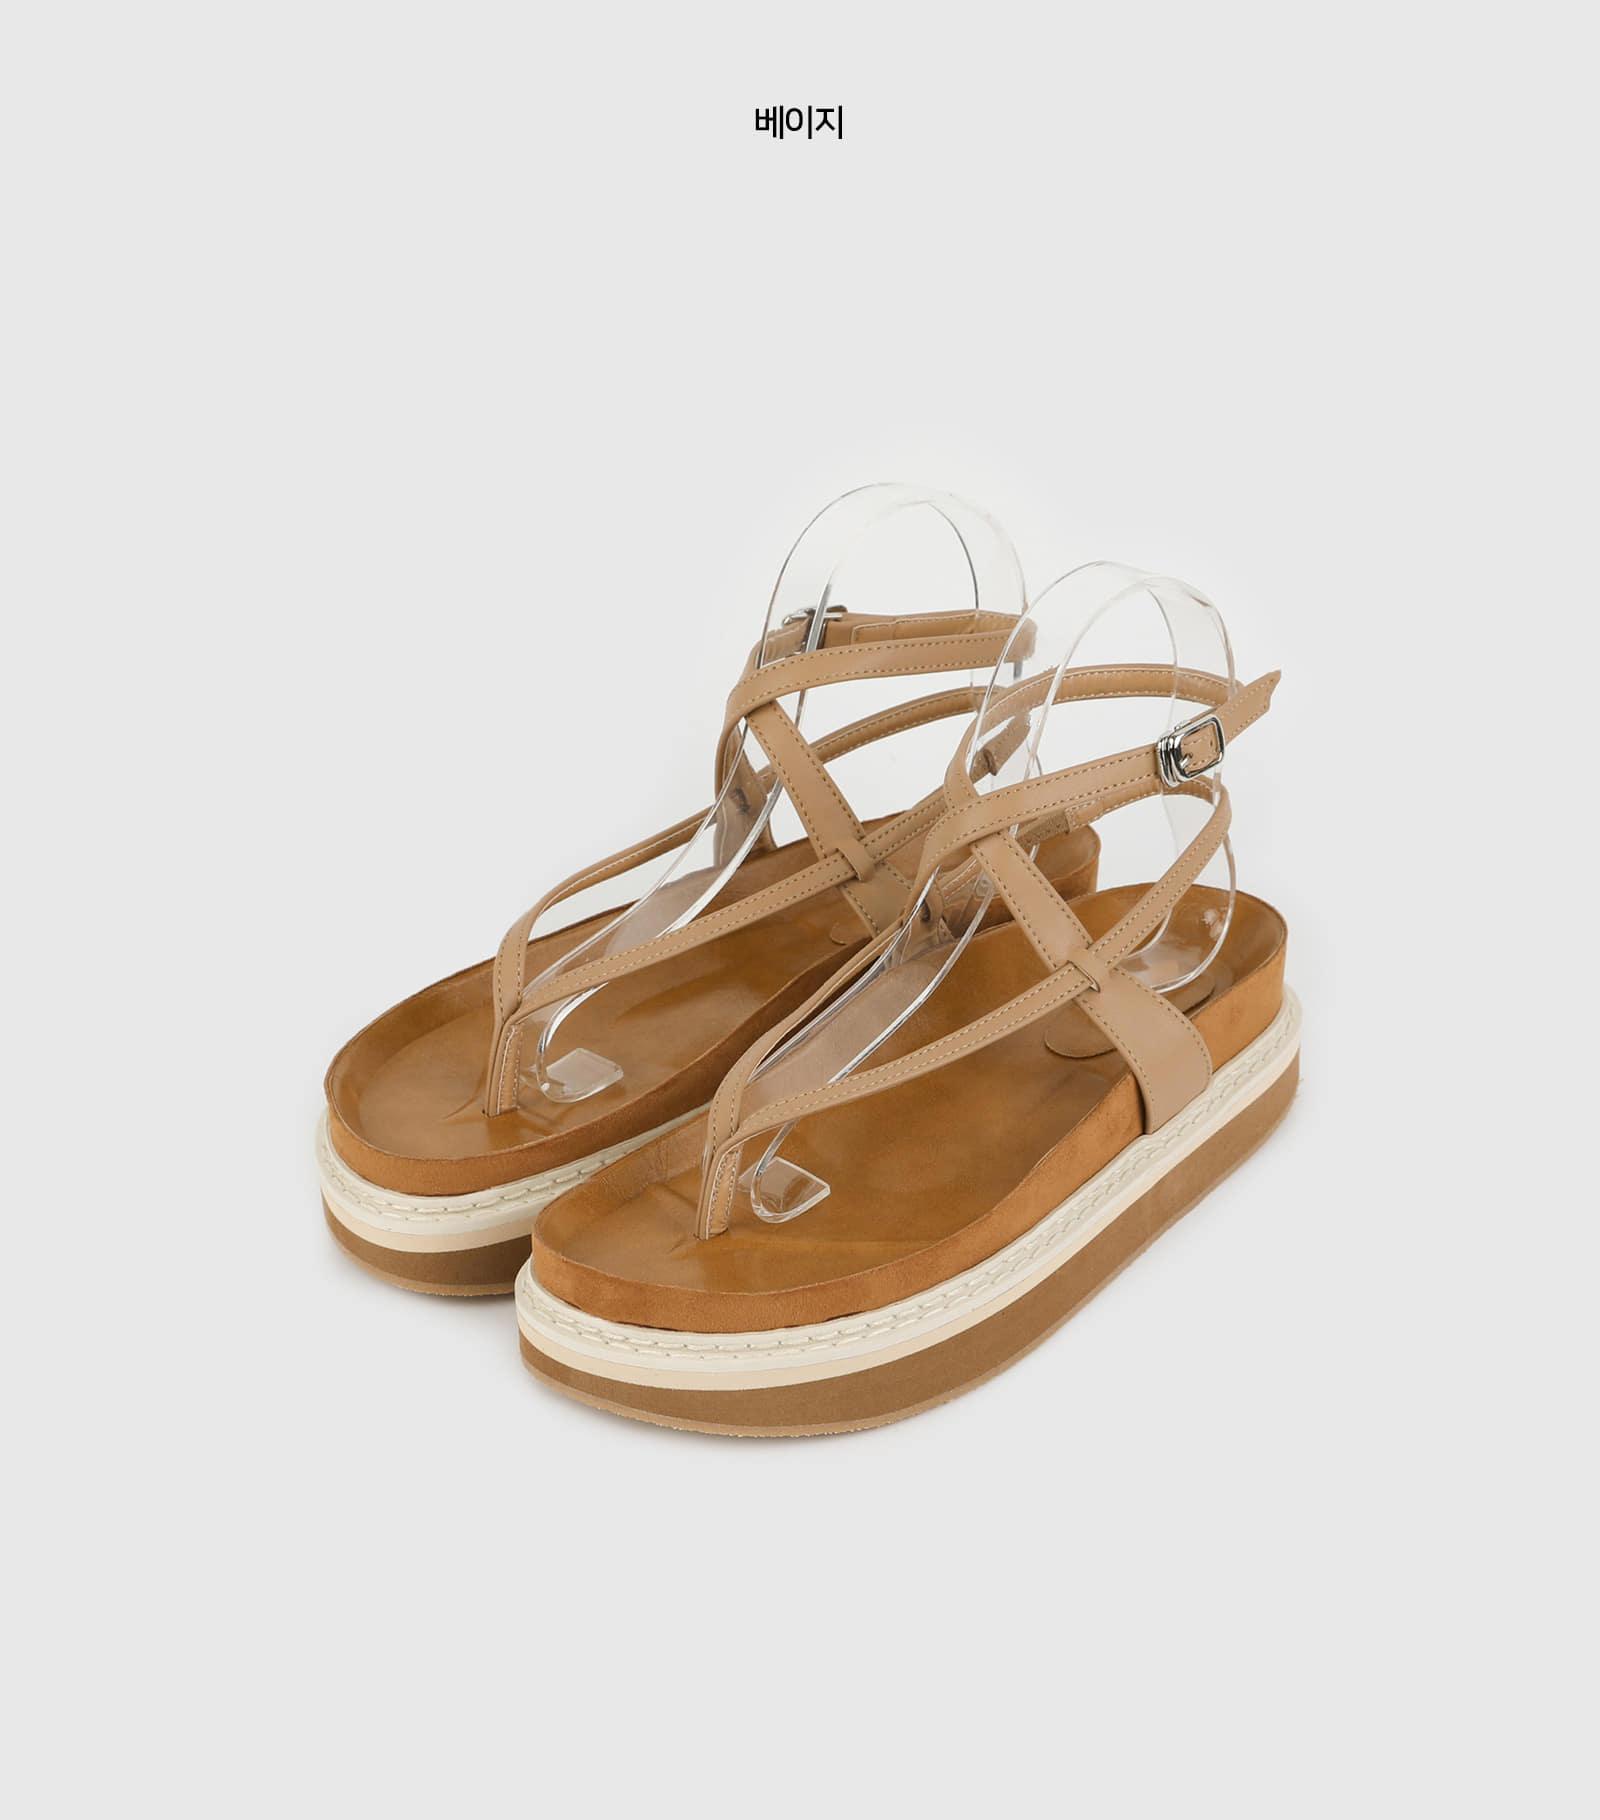 Going strap flip flop sandals